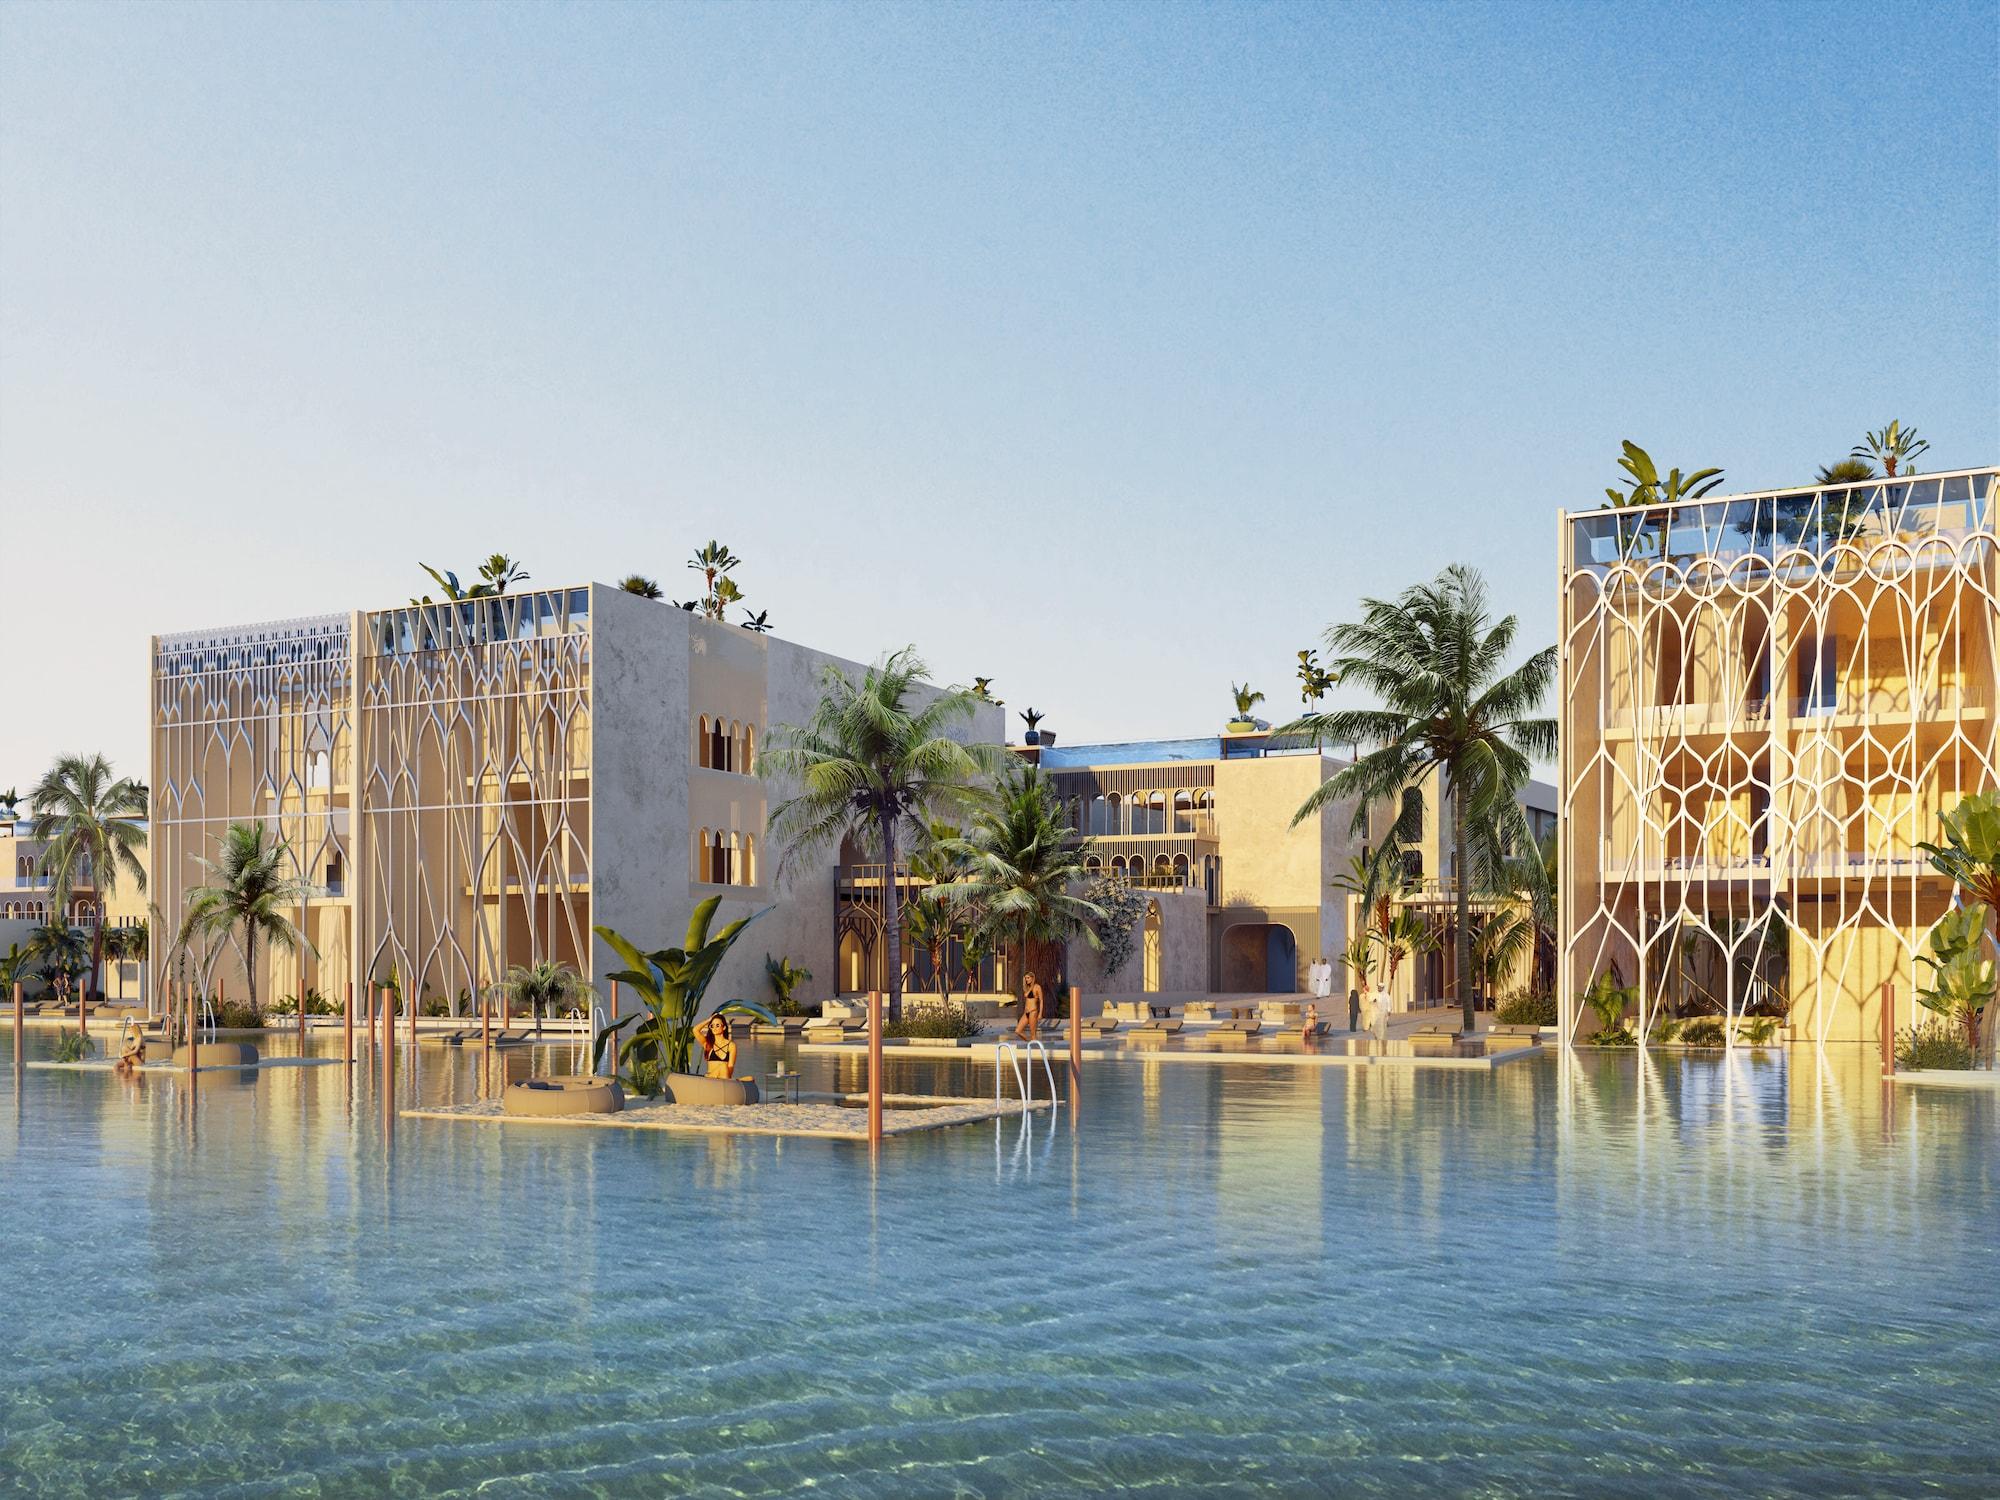 Venedig im Herzen von Dubai: The Floating Venice 6